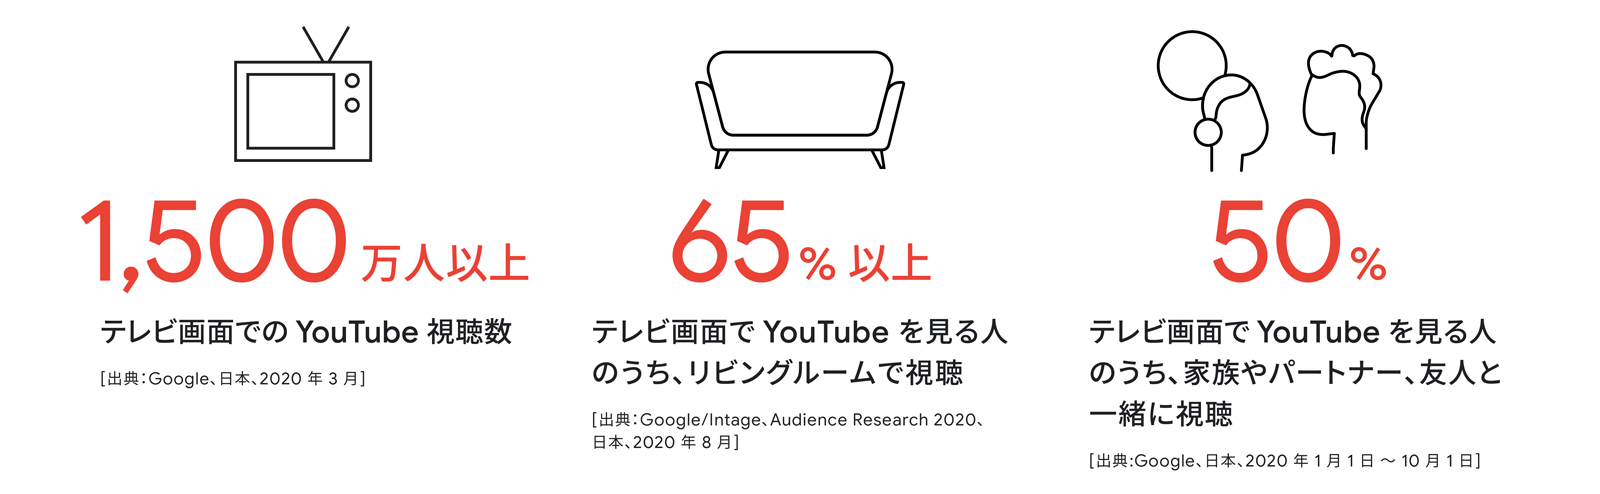 YouTubeの利用実態